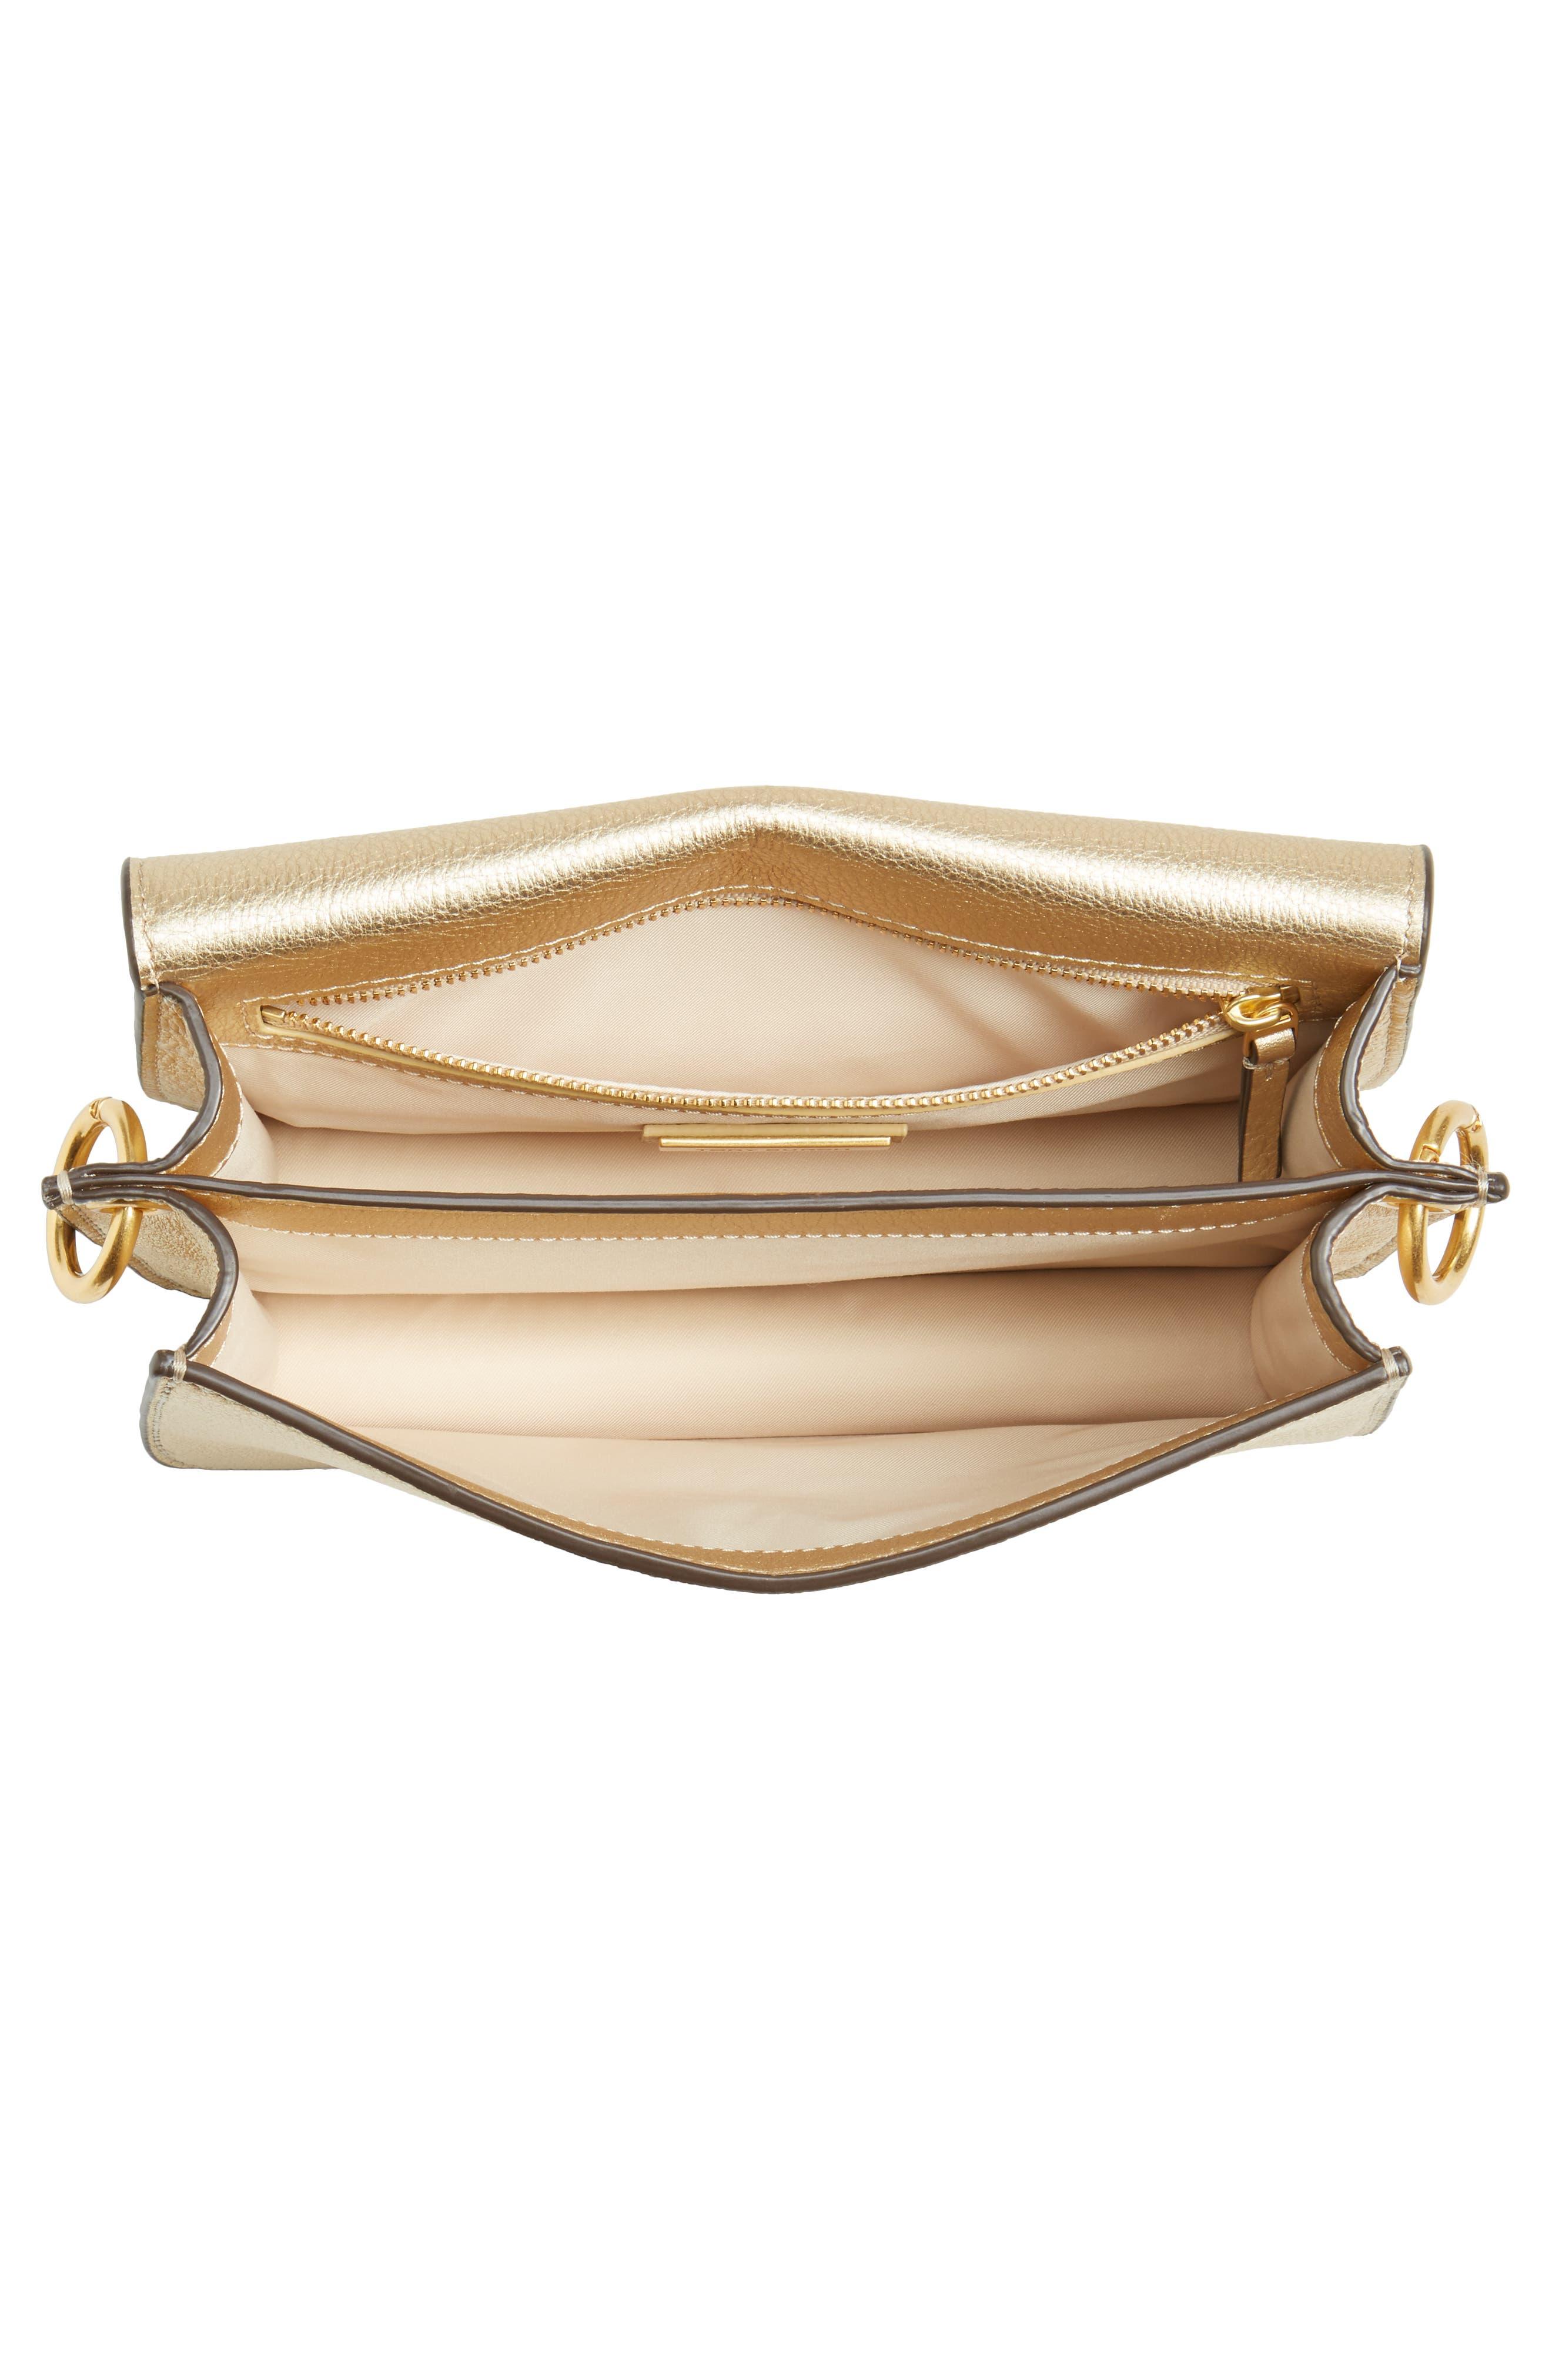 McGraw Metallic Leather Shoulder Bag,                             Alternate thumbnail 4, color,